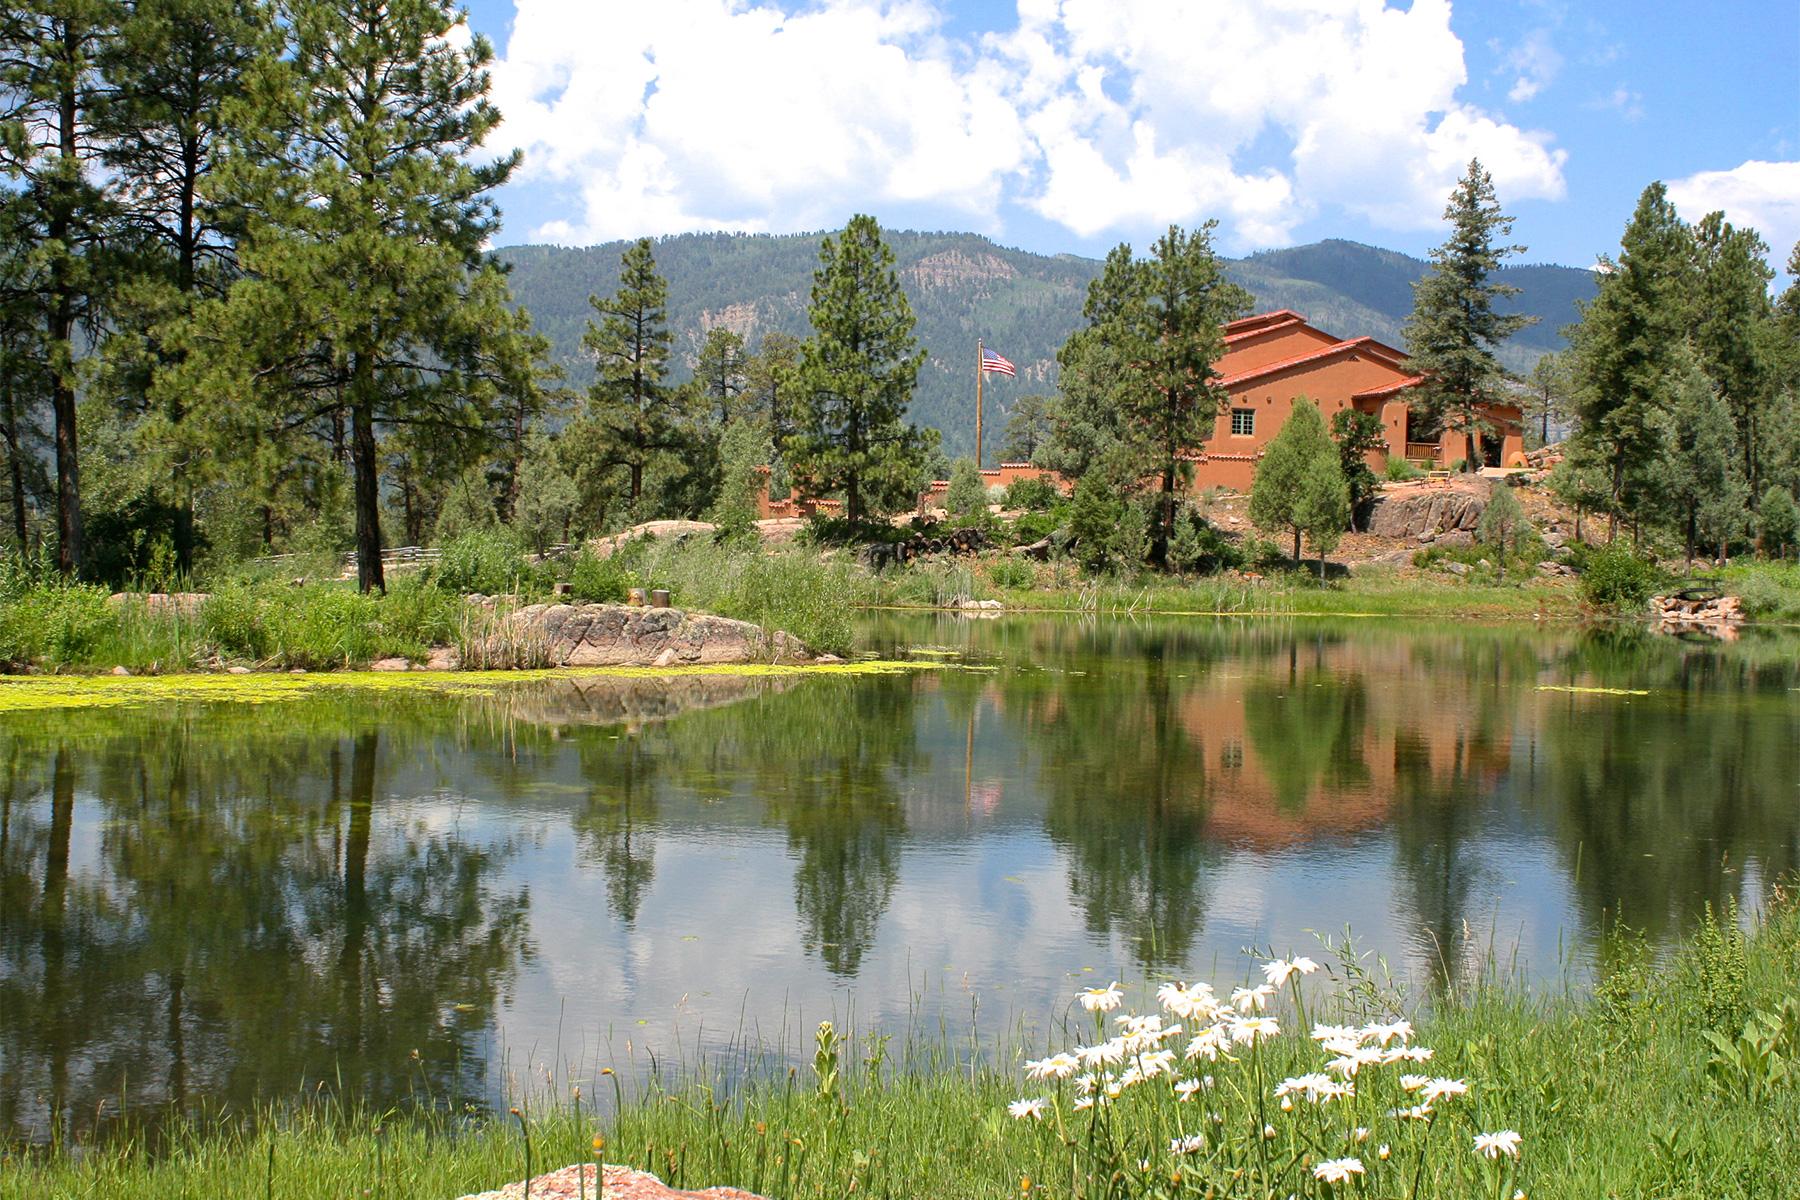 Moradia para Venda às 1401 Celadon Drive 1401 Celadon Drive East Durango, Colorado, 81301 Estados Unidos